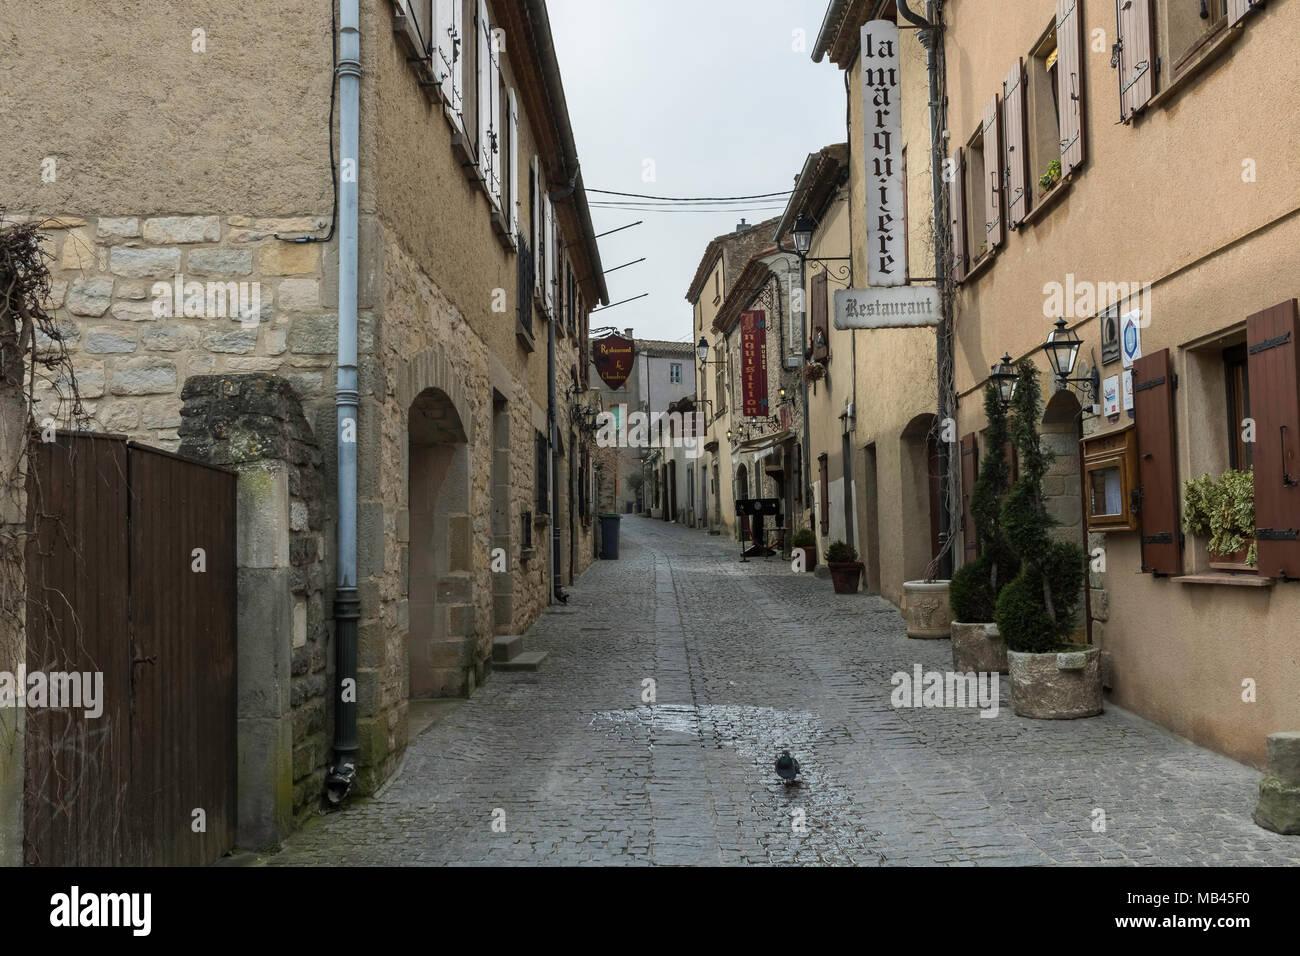 Carcassonne France Medieval Street Stock Photos Carcassonne France